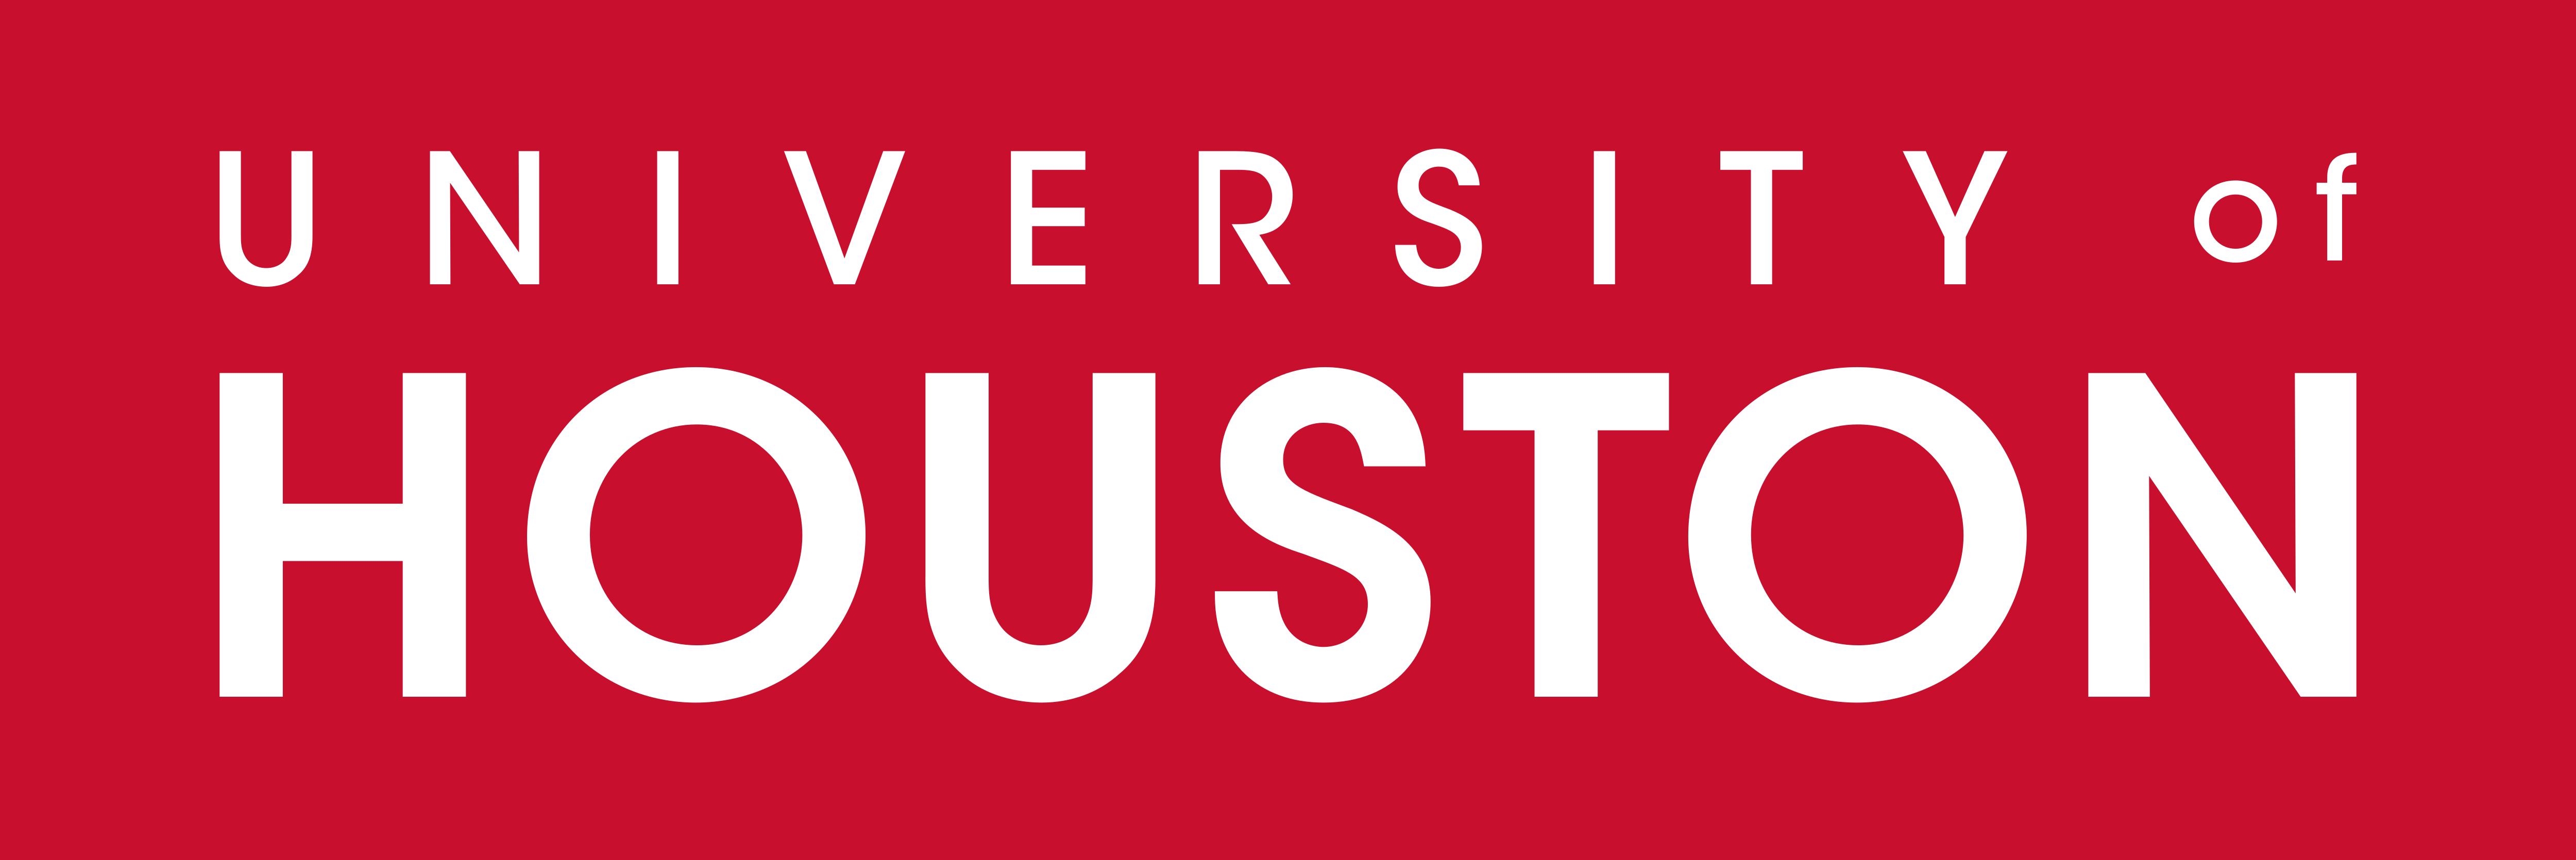 University of Houston's logo